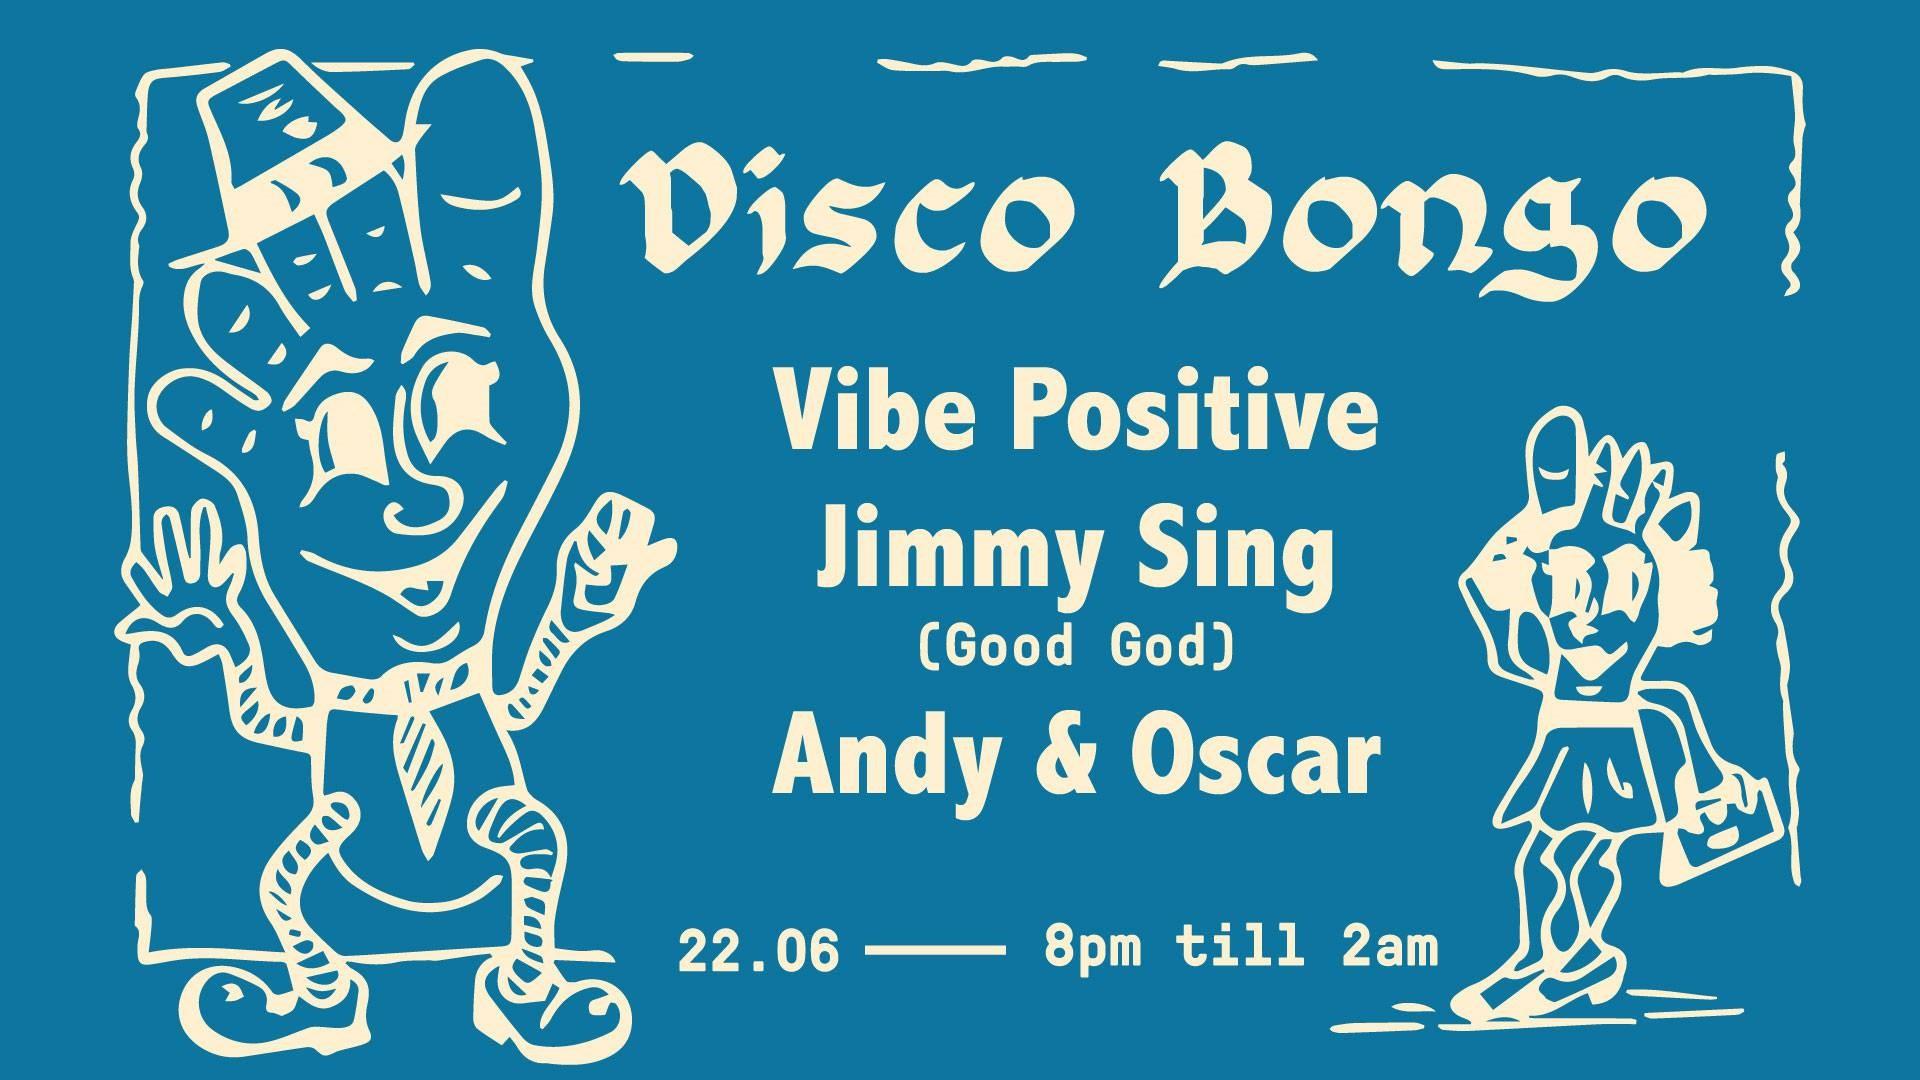 RA: Disco Bongo w  Jimmy Sing, Vibe Postive, Andy & Oscar at